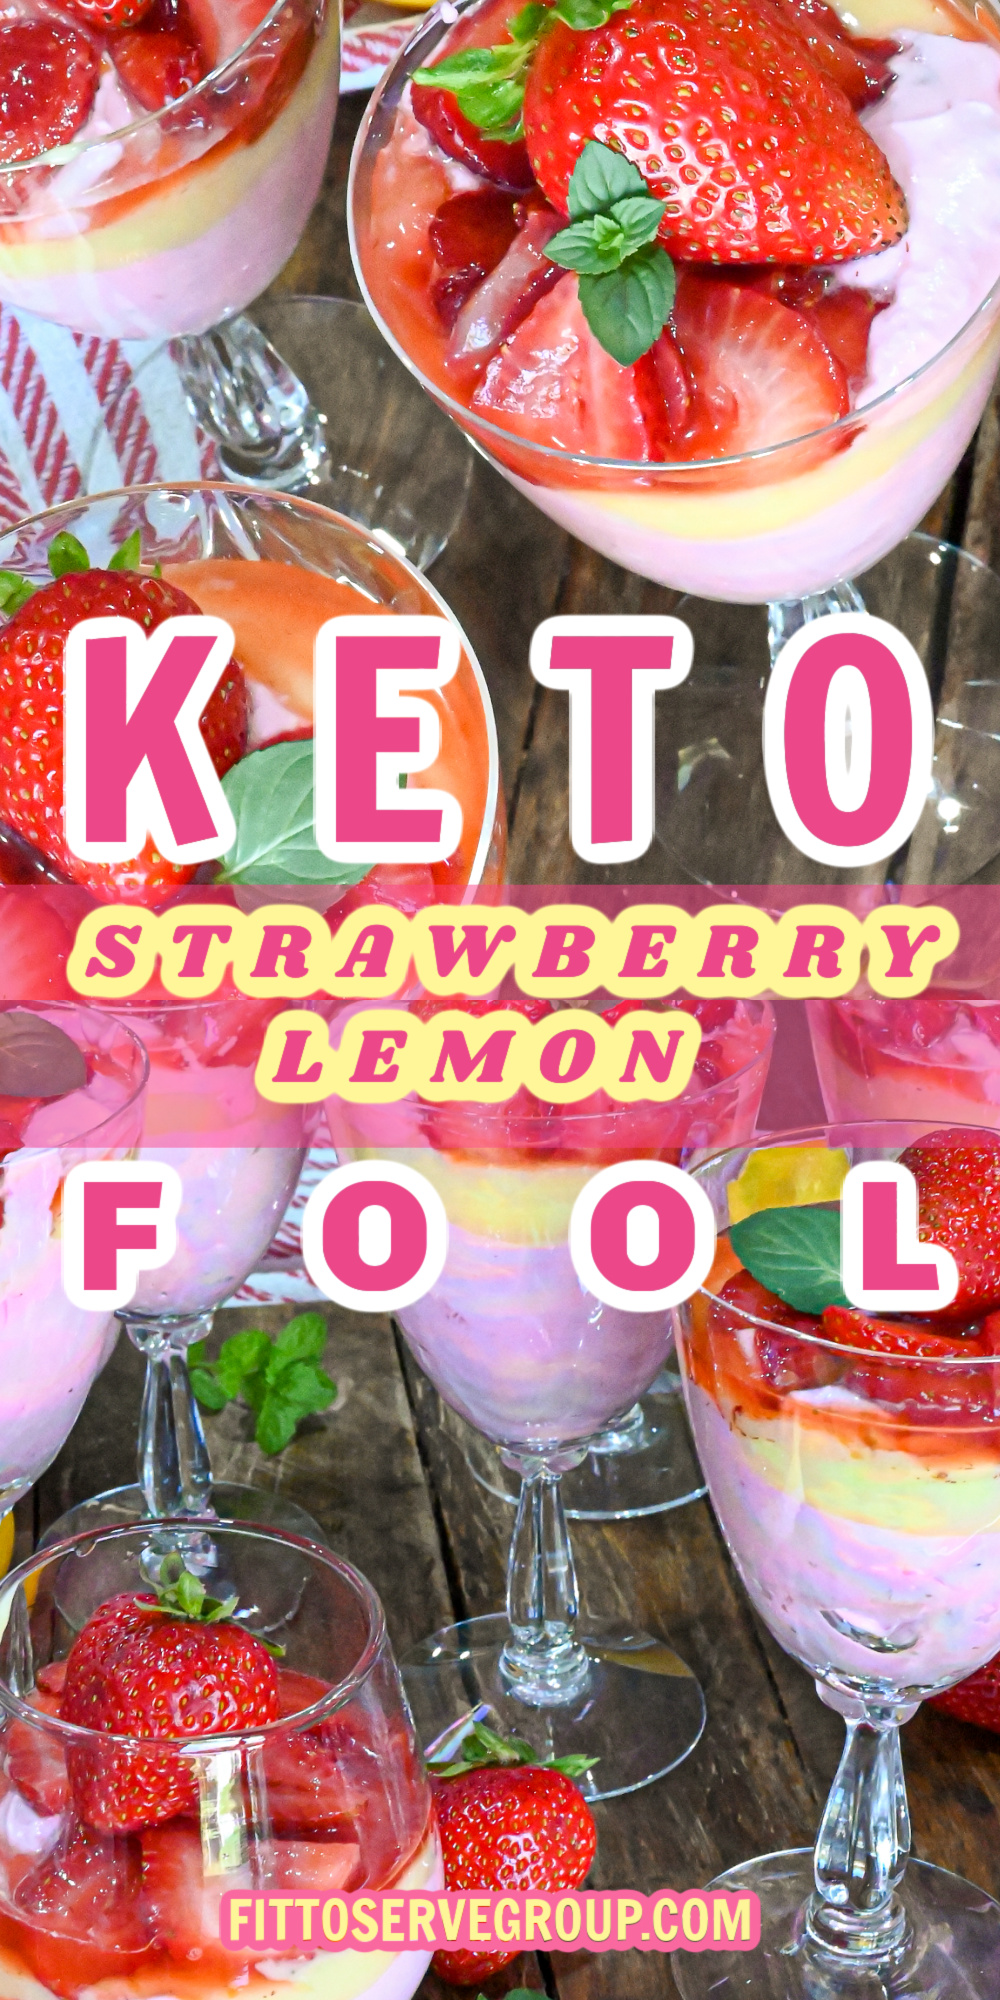 Keto strawberry lemon fool recipe